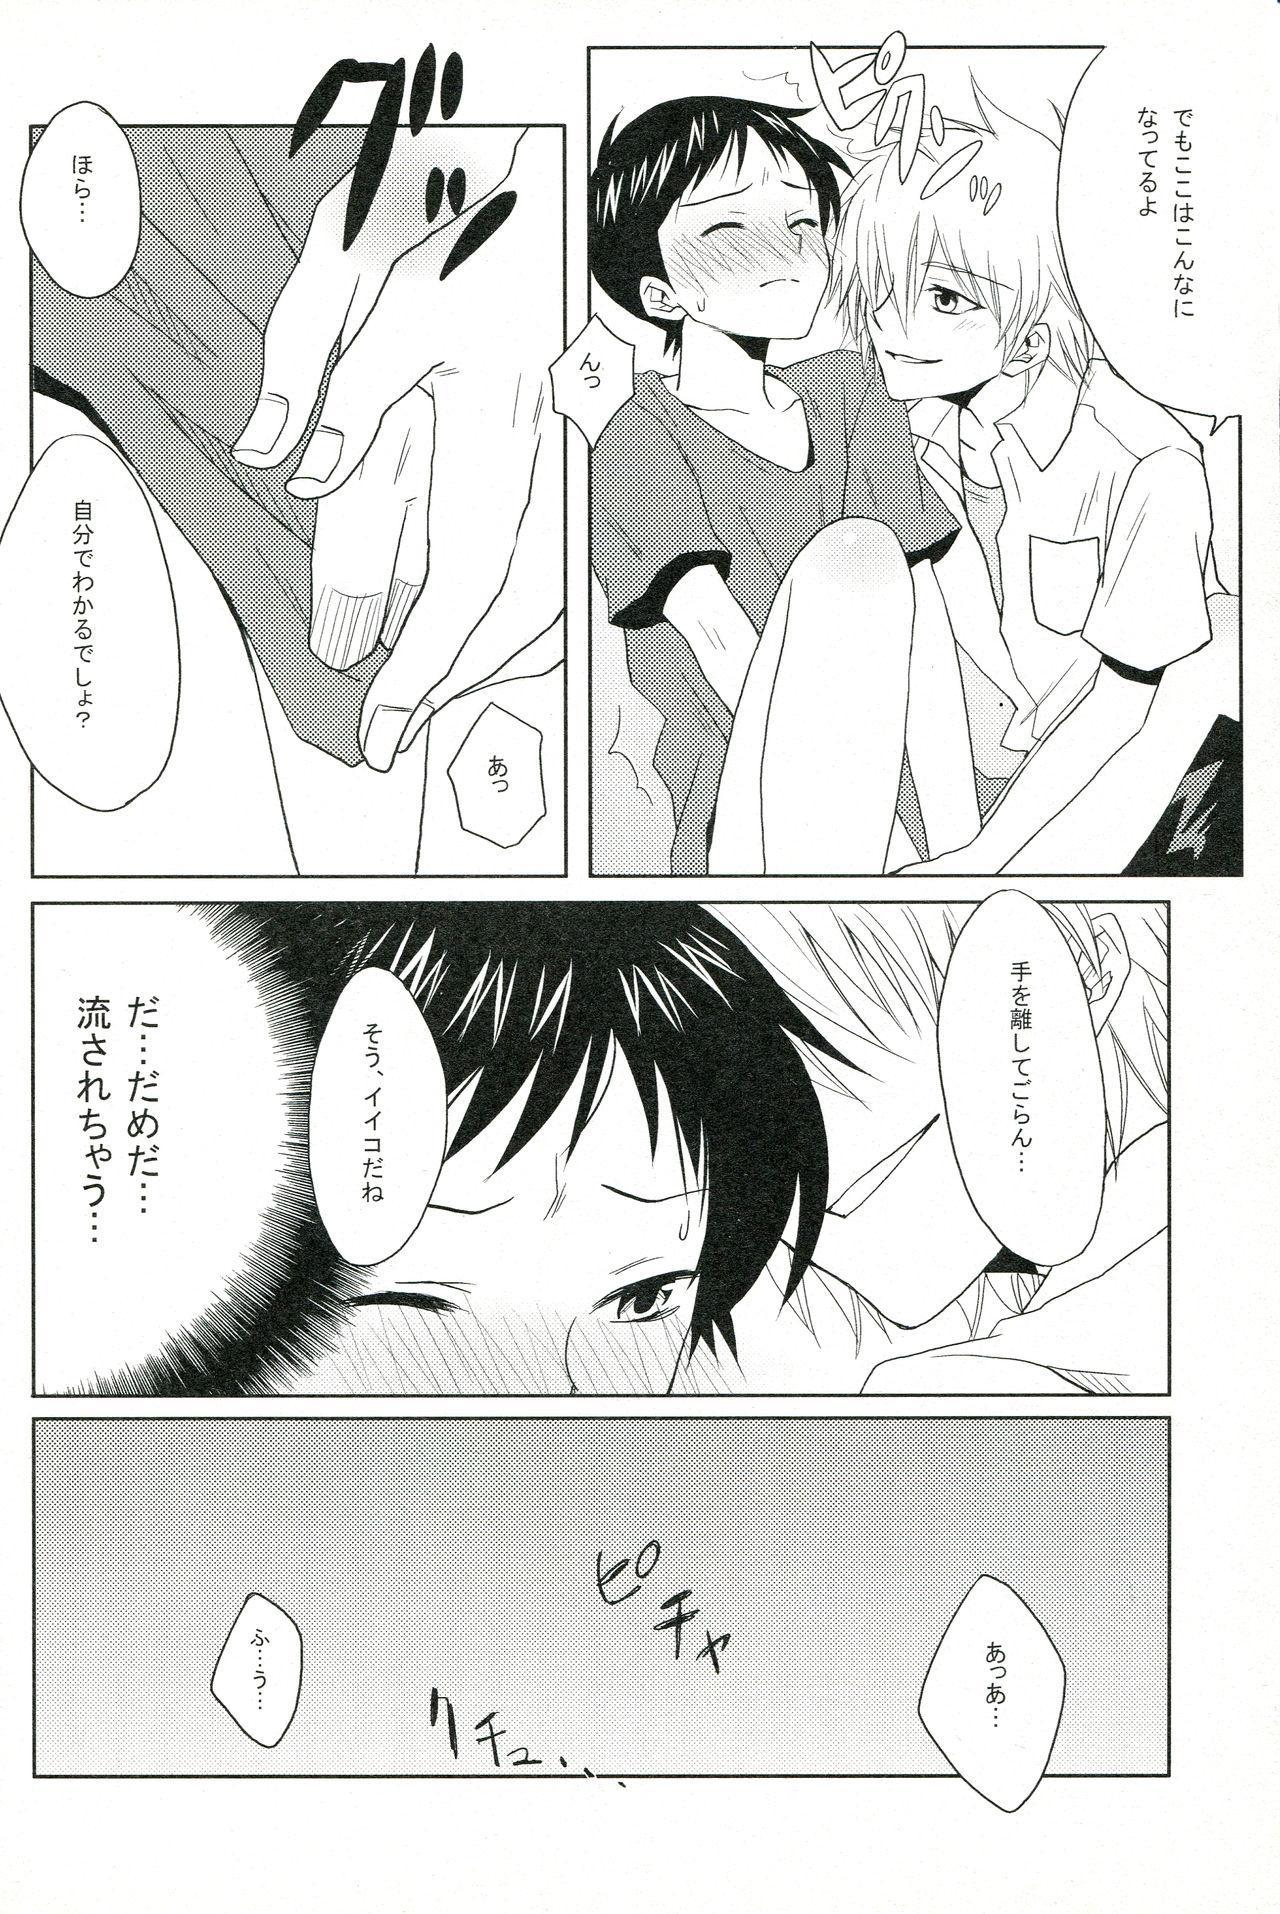 PSP Eva 2 no Susume 8